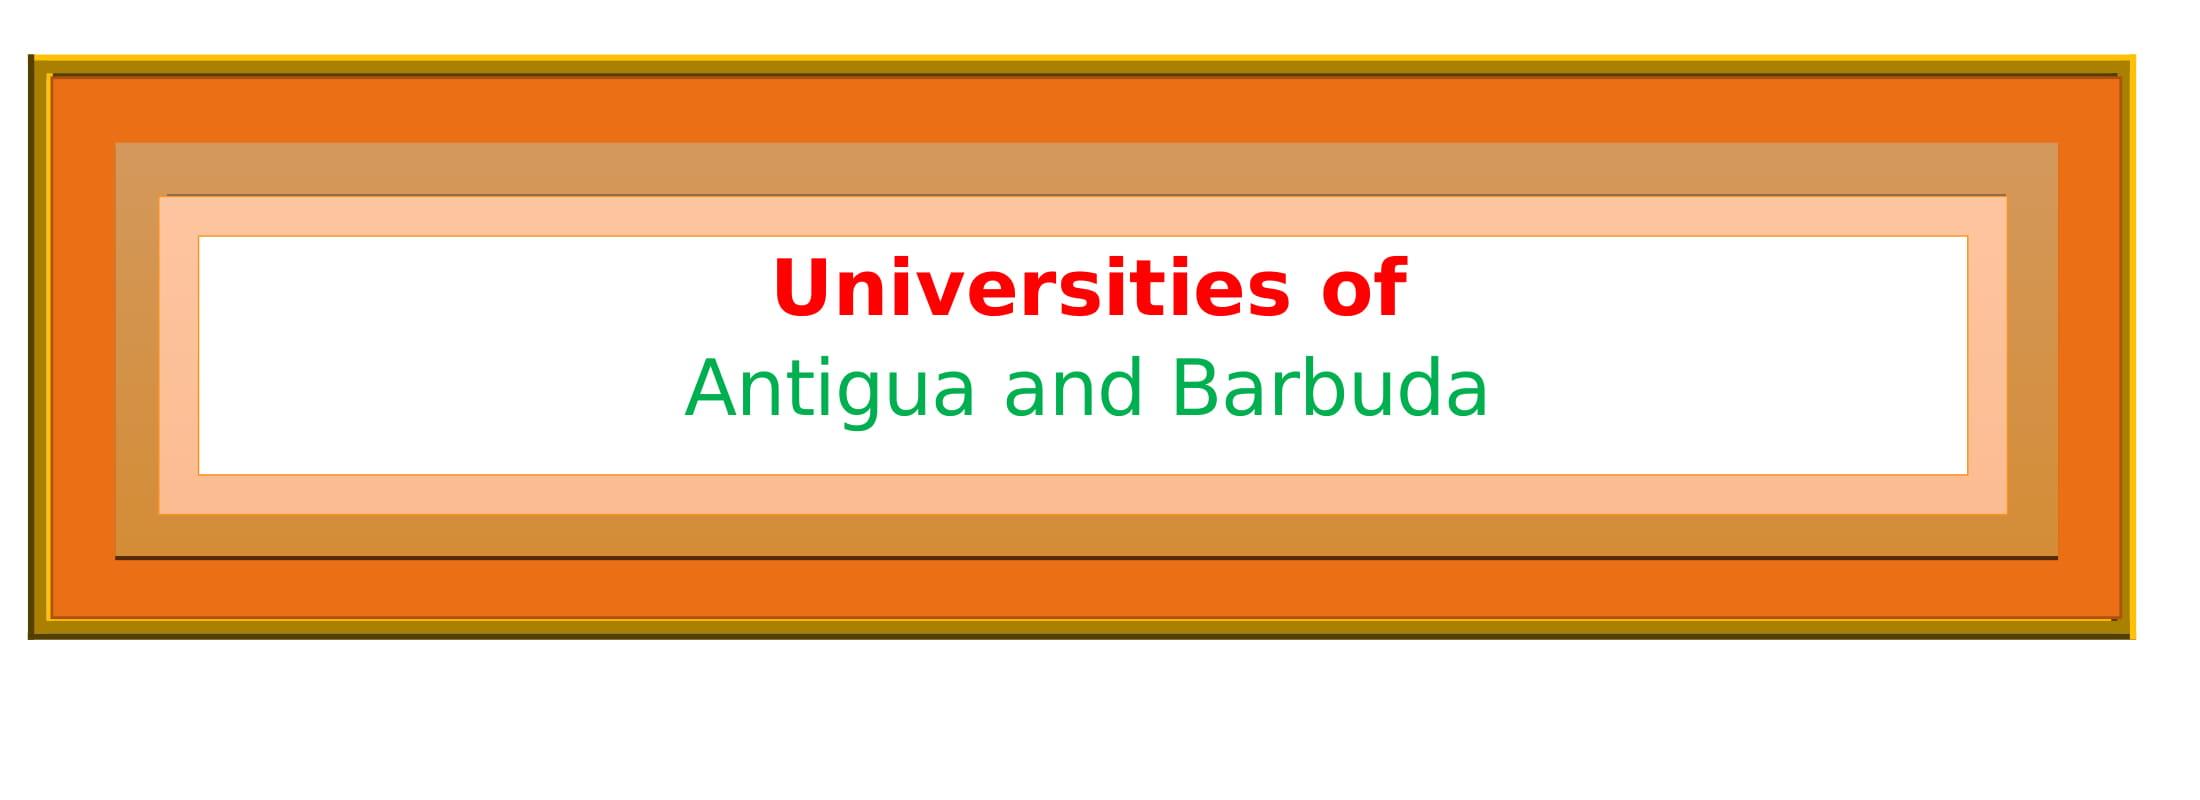 List of Universities in Antigua and Barbuda